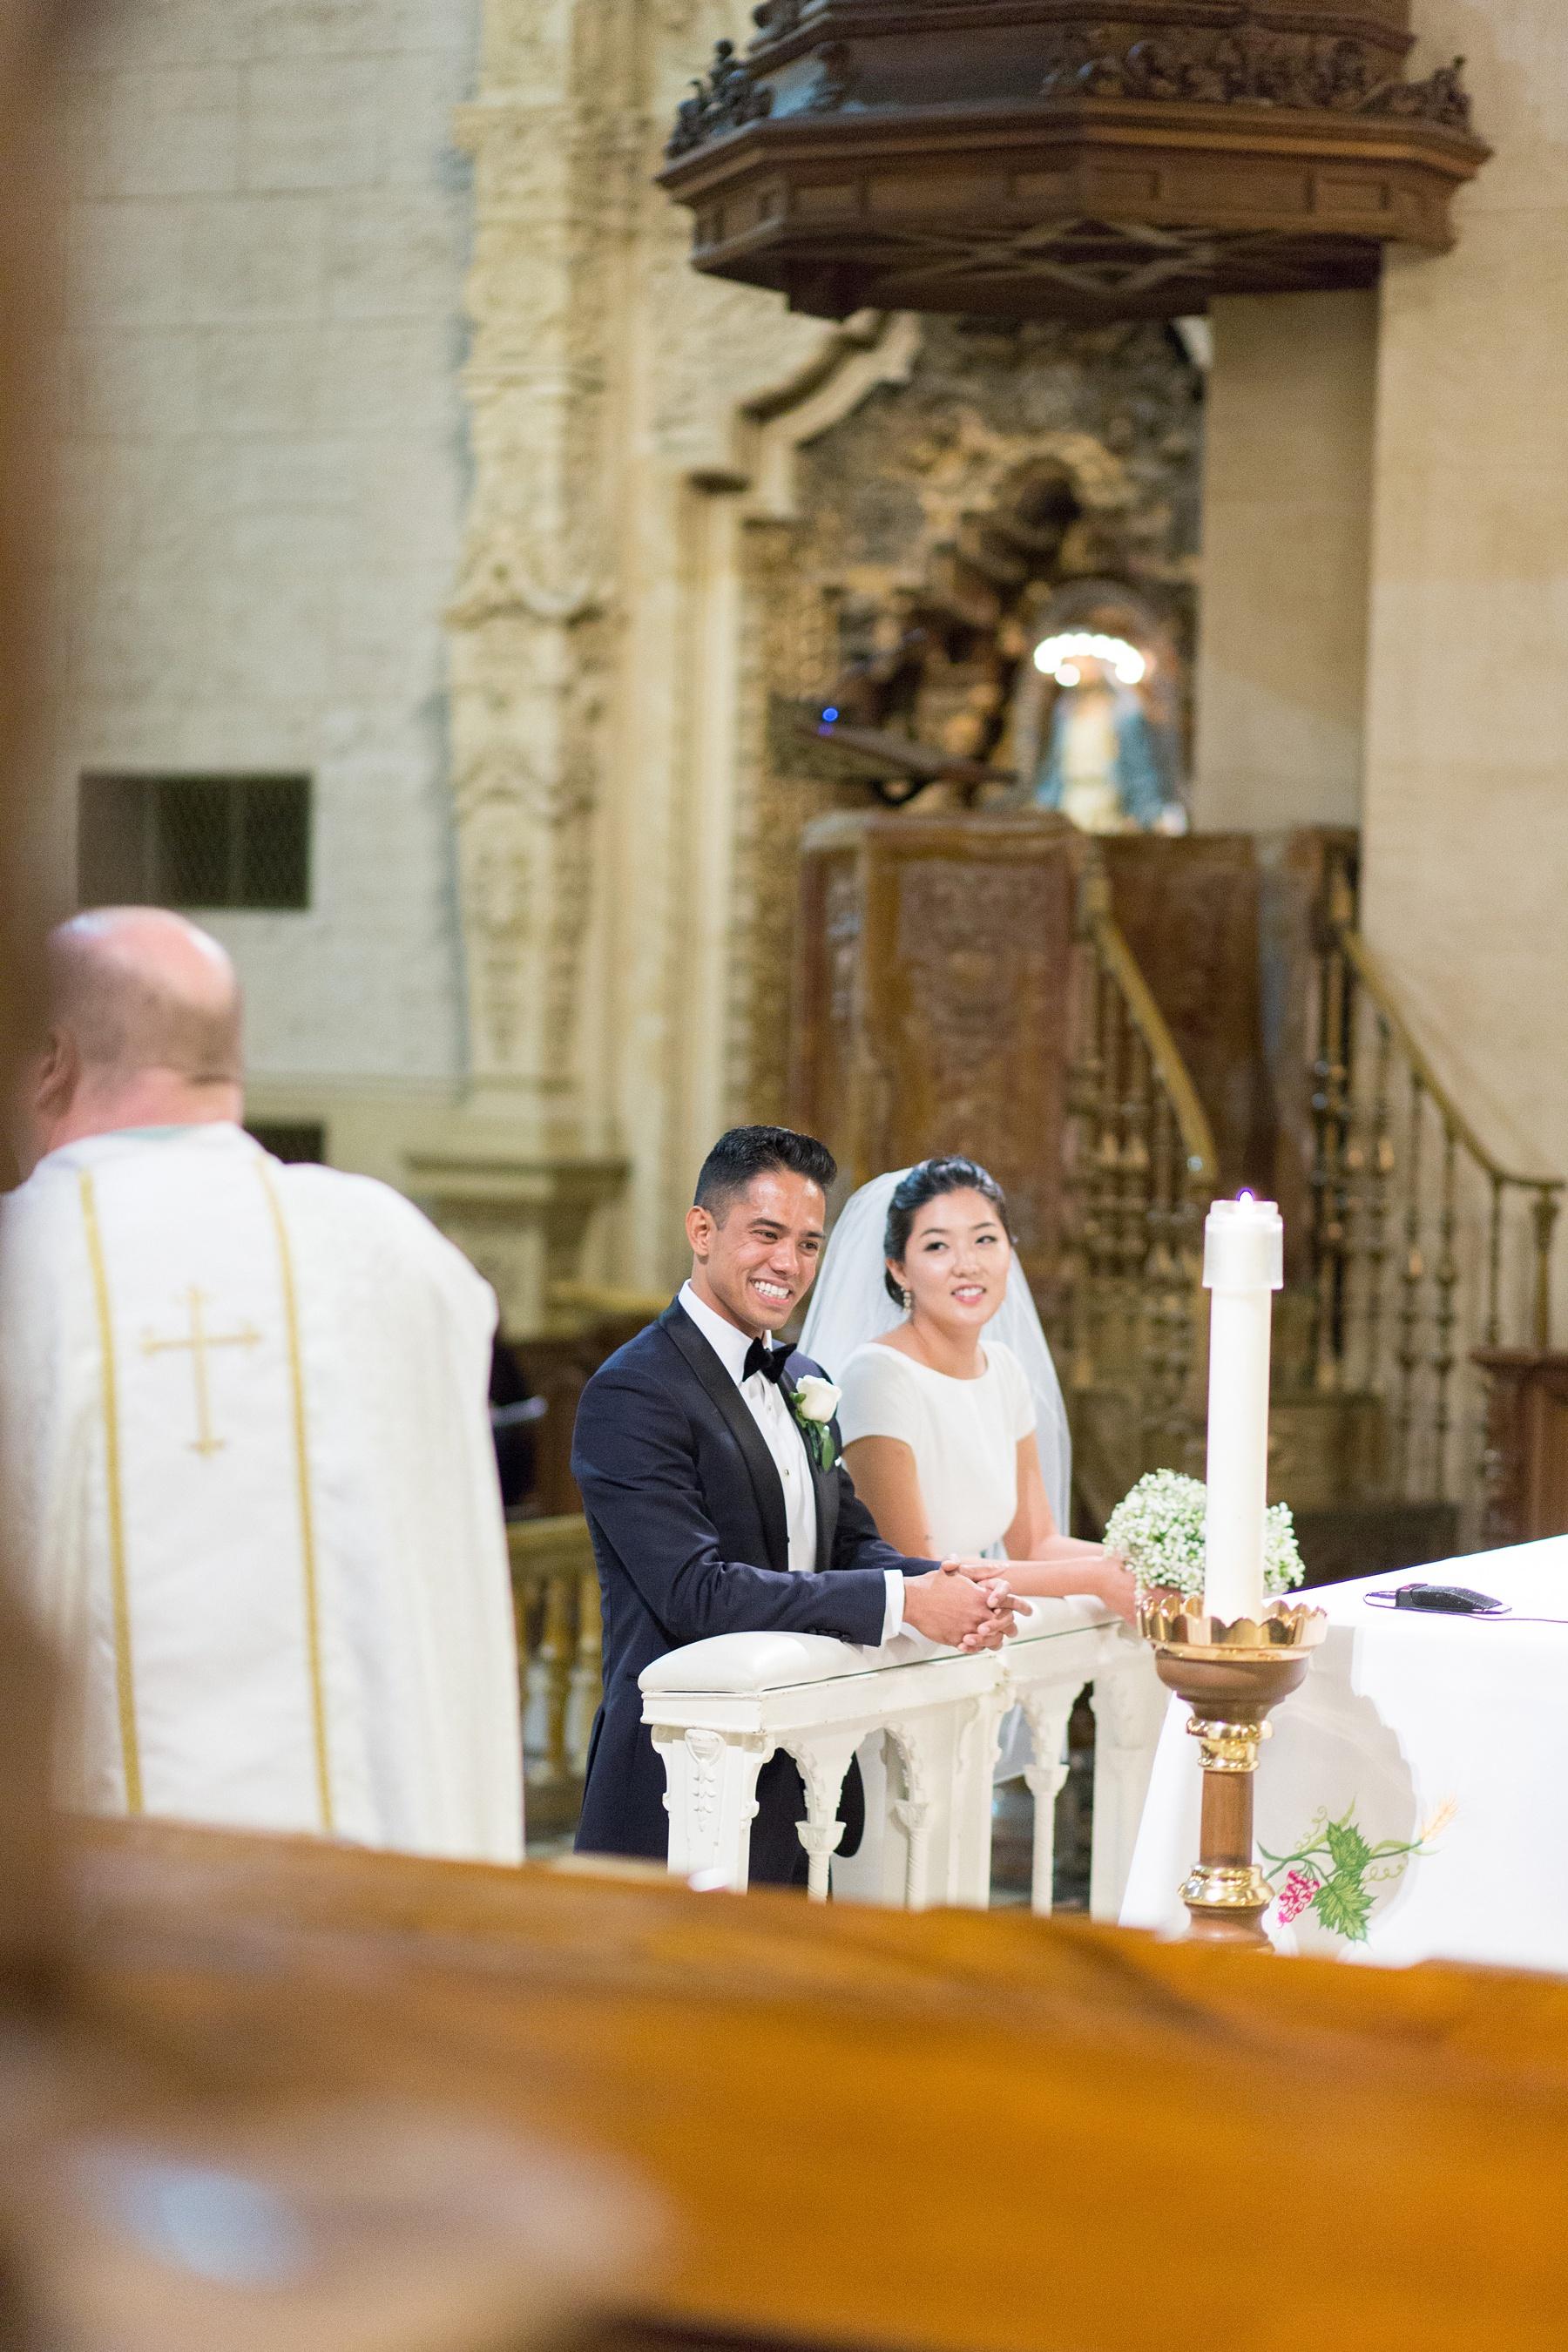 Urban DTLA Wedding at Millwick By Wedding Photographer Madison Ellis (75)